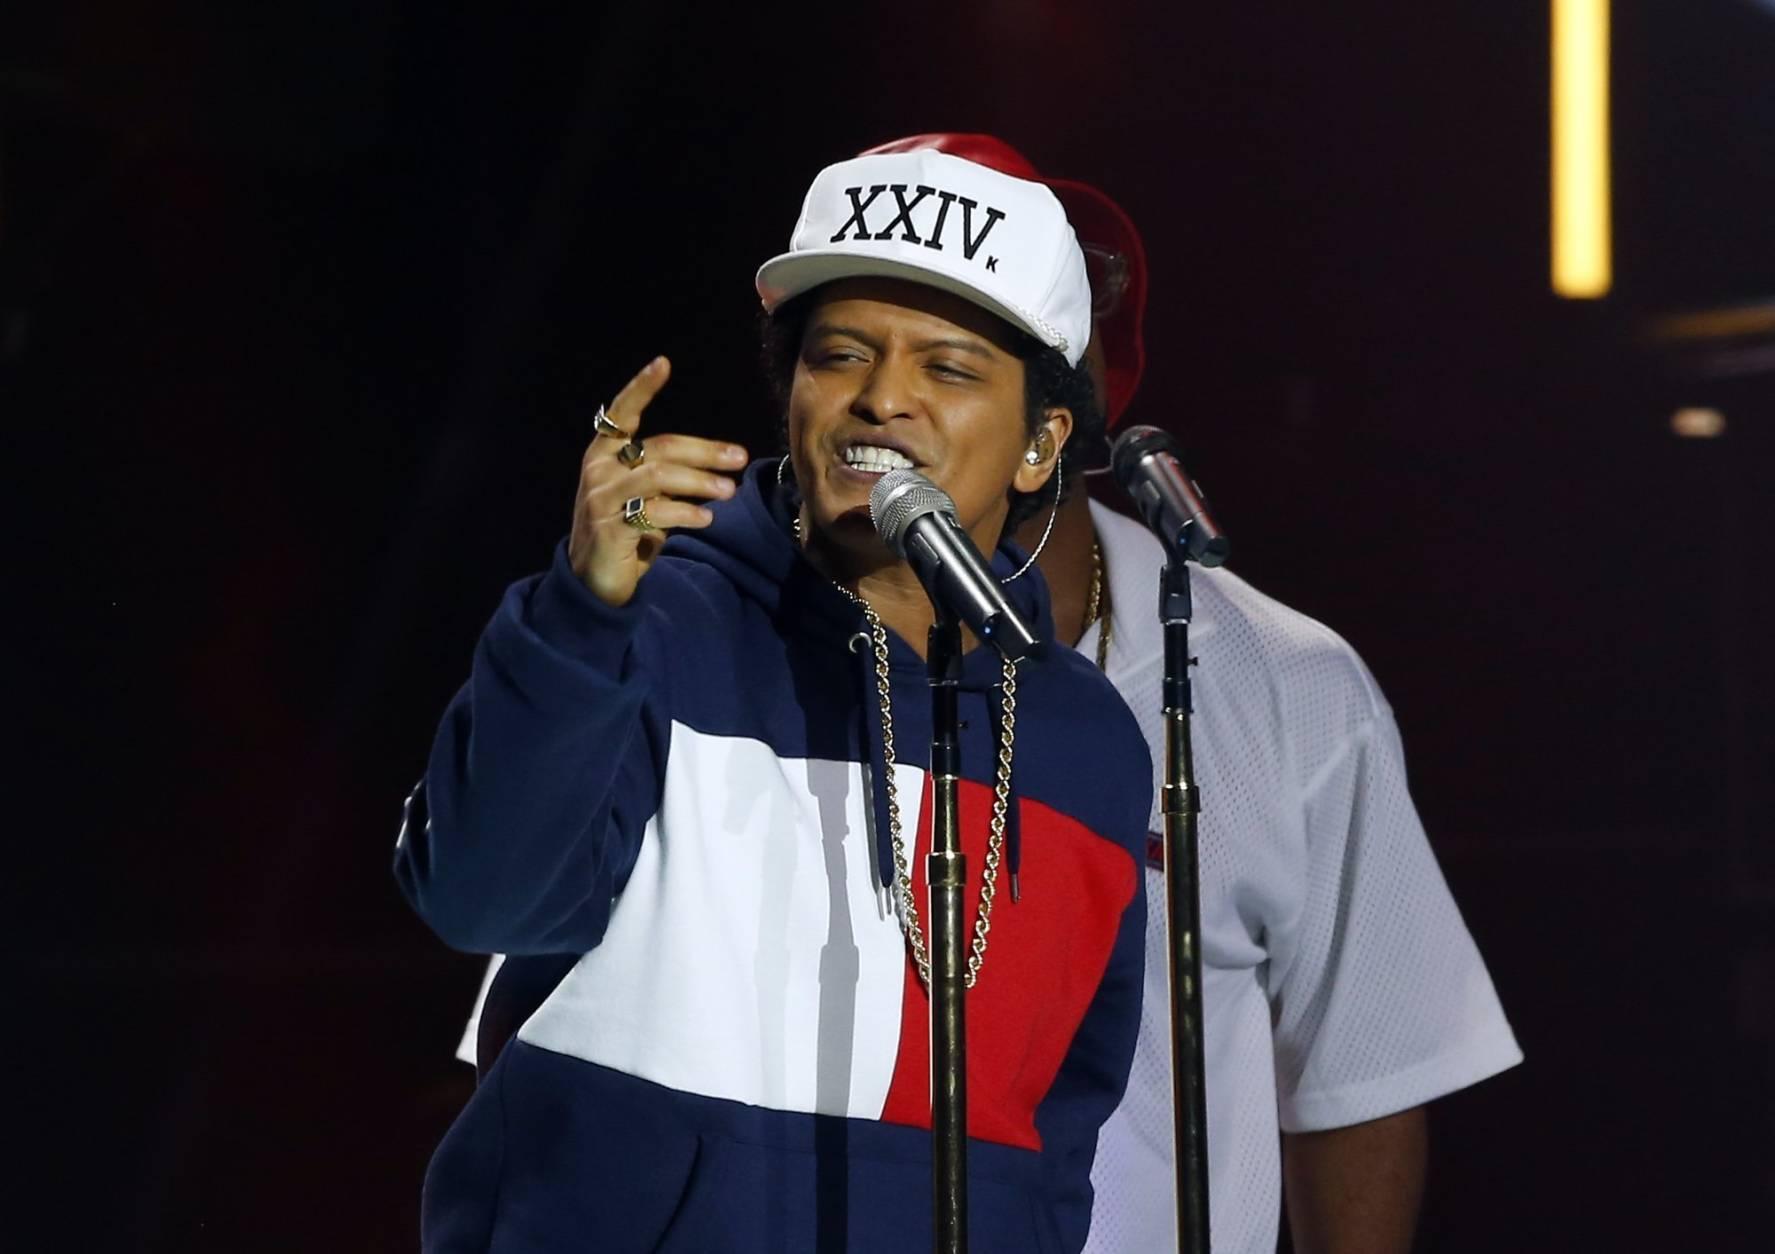 Bruno Mars will perform at MGM National Harbor De. 27, 2016. (AP Photo/Peter Dejong)